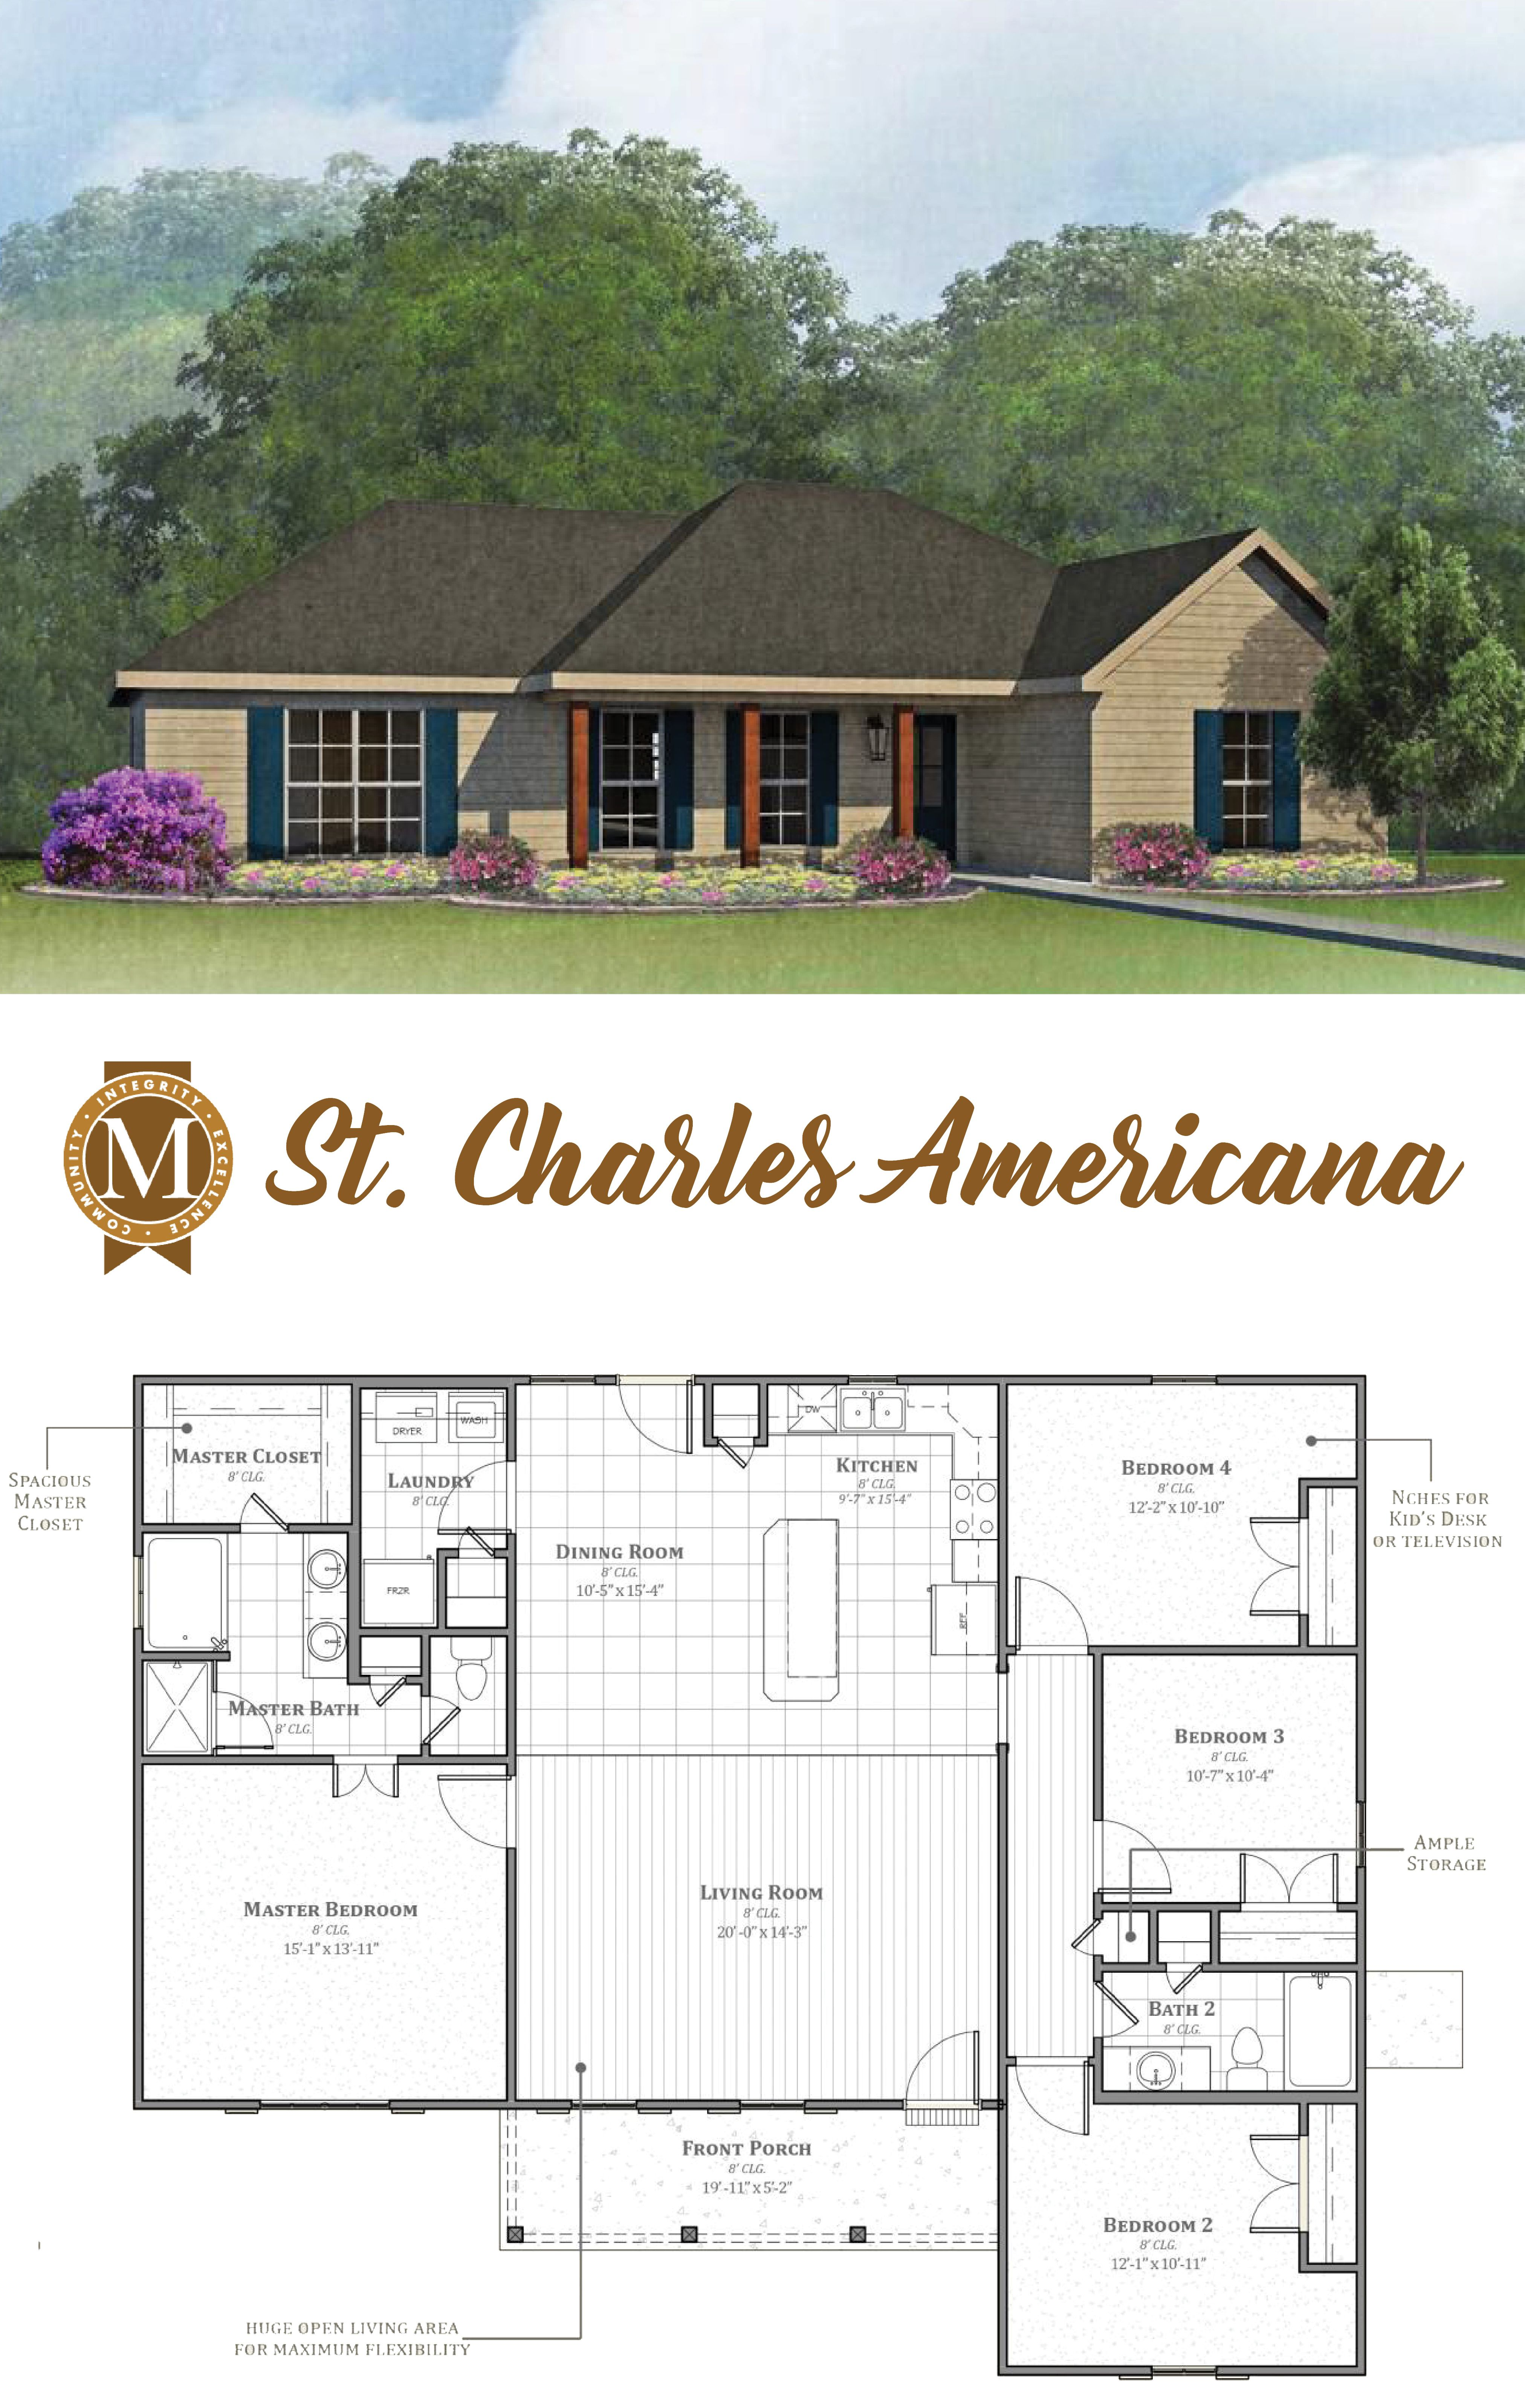 Living Sq Ft 1 710 Bedrooms 4 Baths 2 Lafayette Lake Charles Baton Rouge Louisiana House Blueprints Dream House Plans Cottage Plan